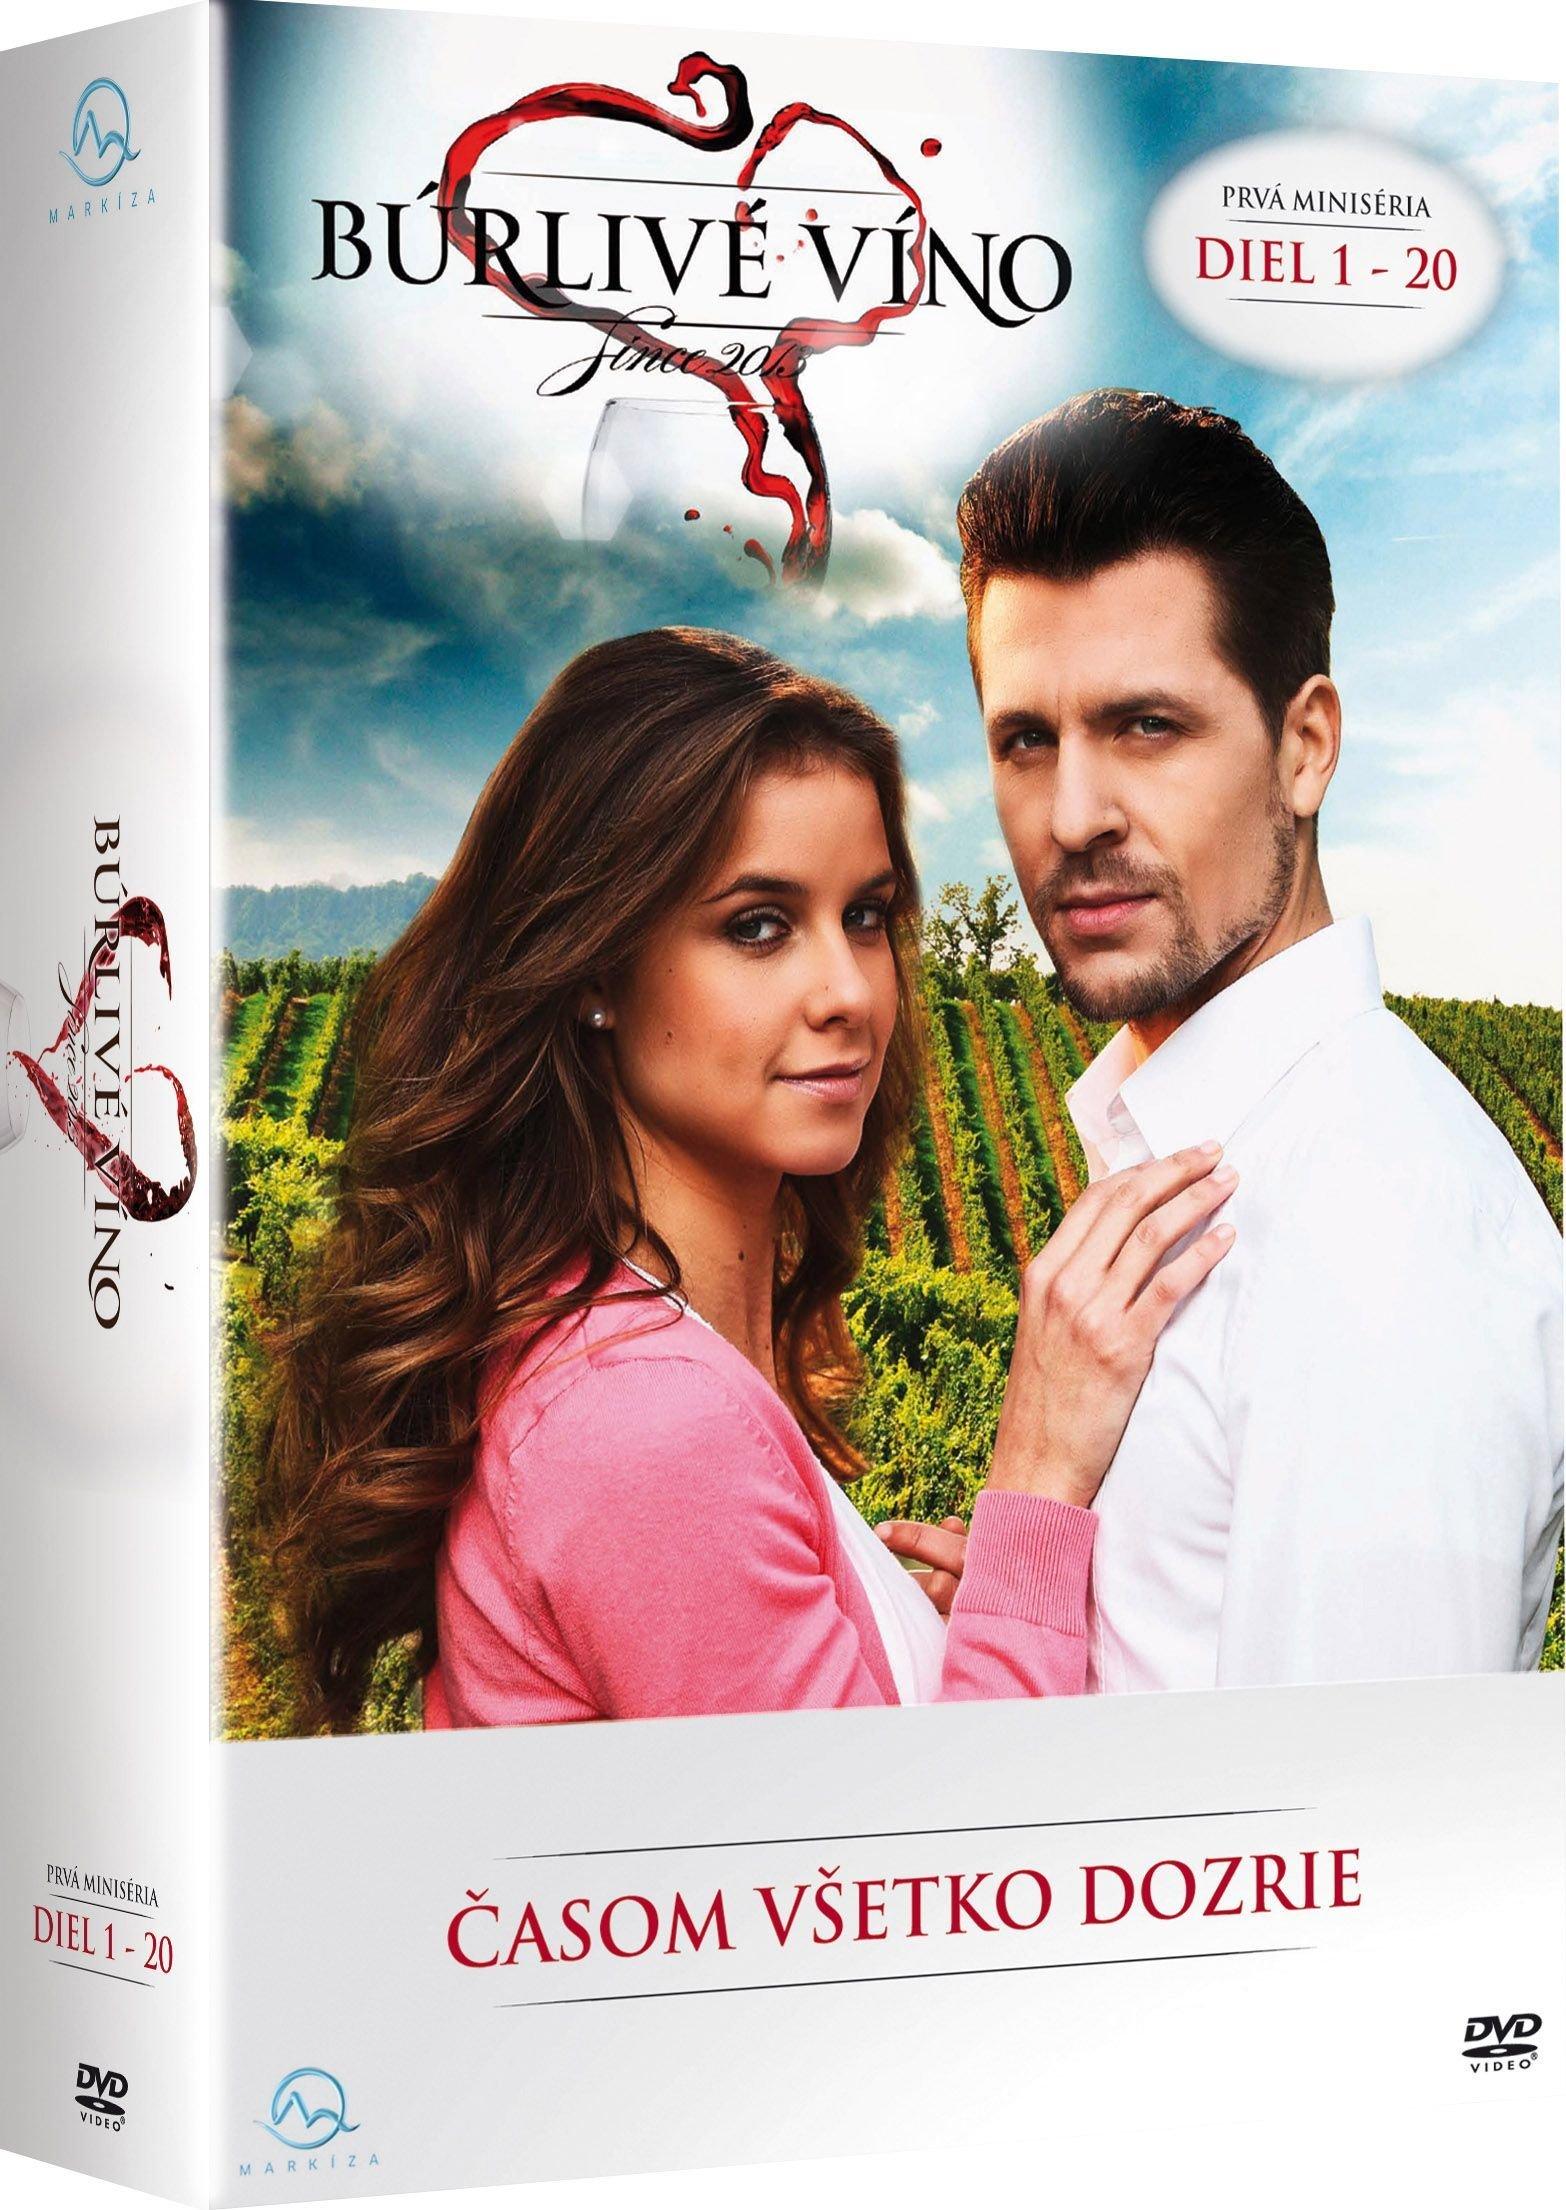 burlive vino 1 cast